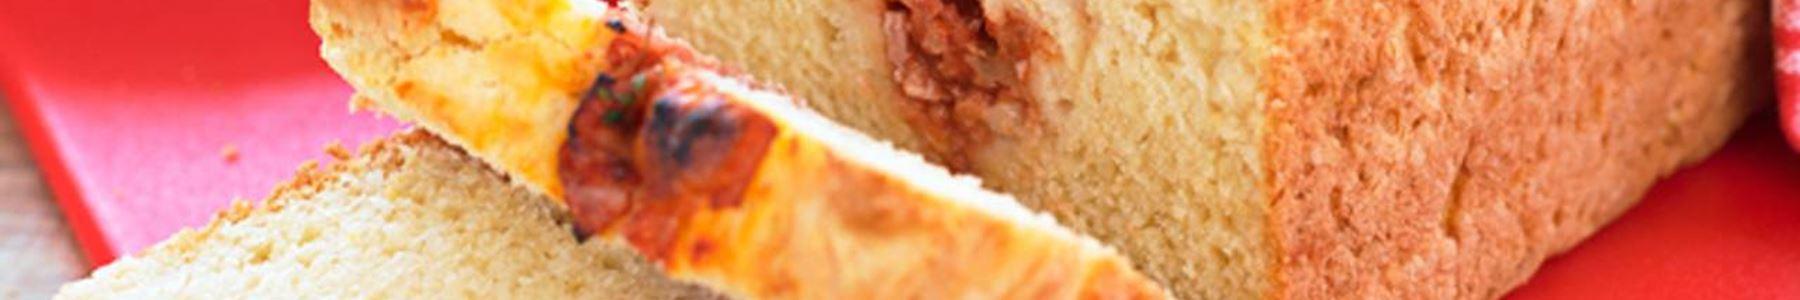 Tomat + Bakpulver + Bröd